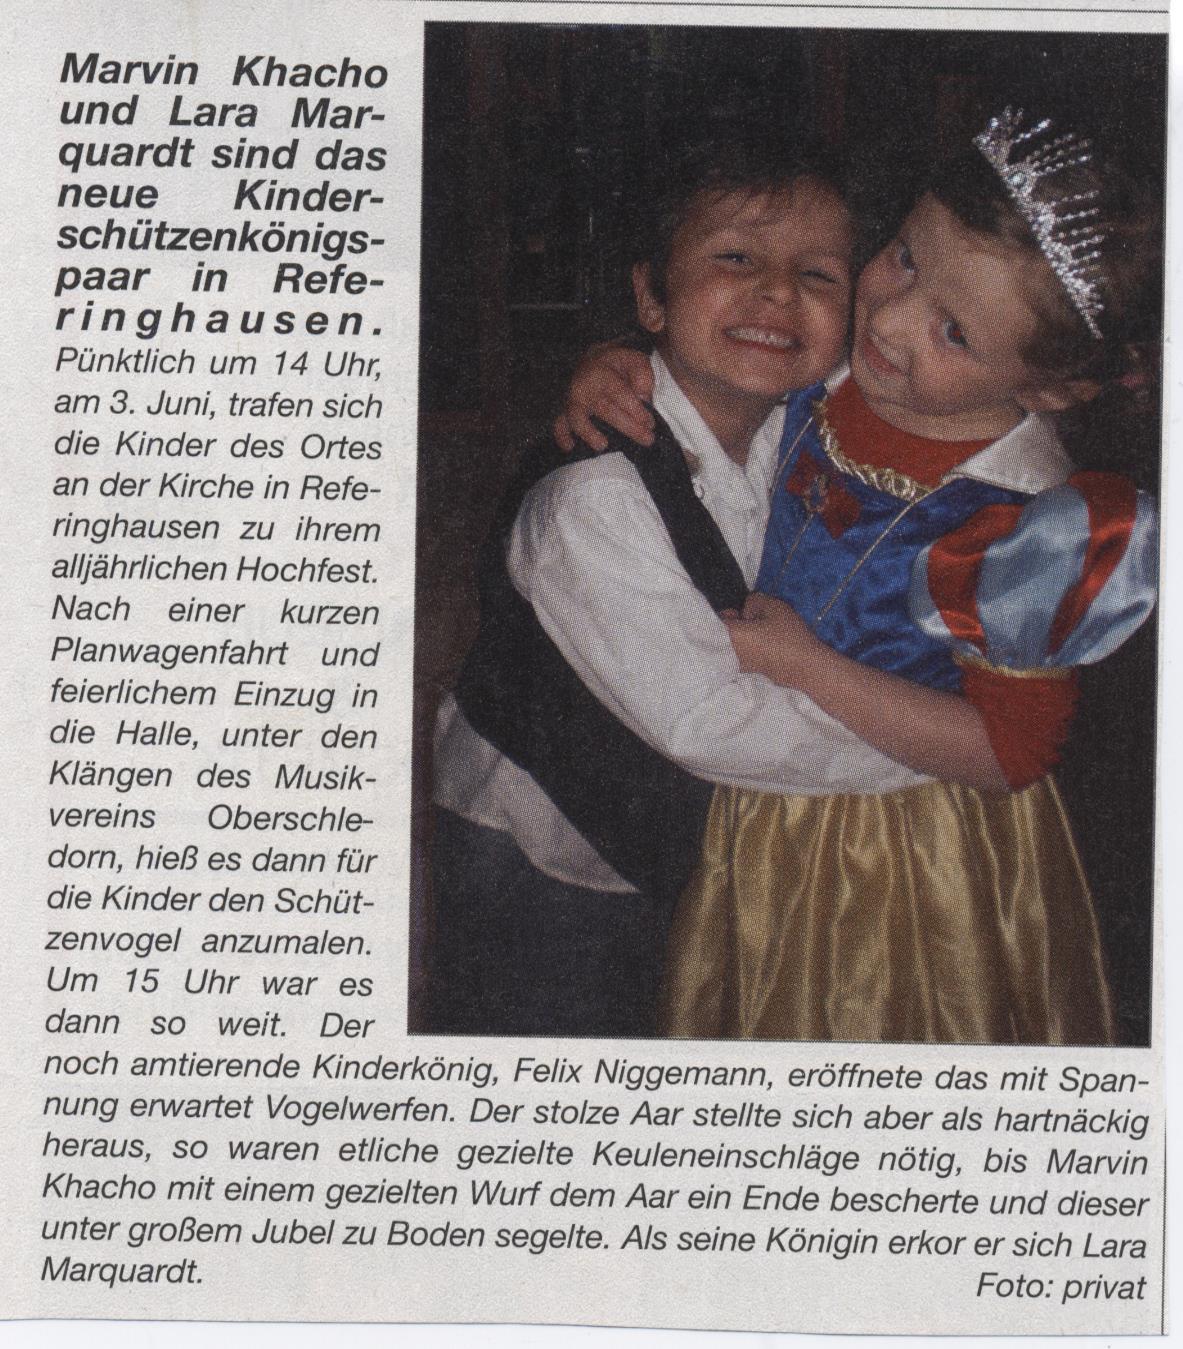 Kinderschützenkönigspaar Marvin und Lara